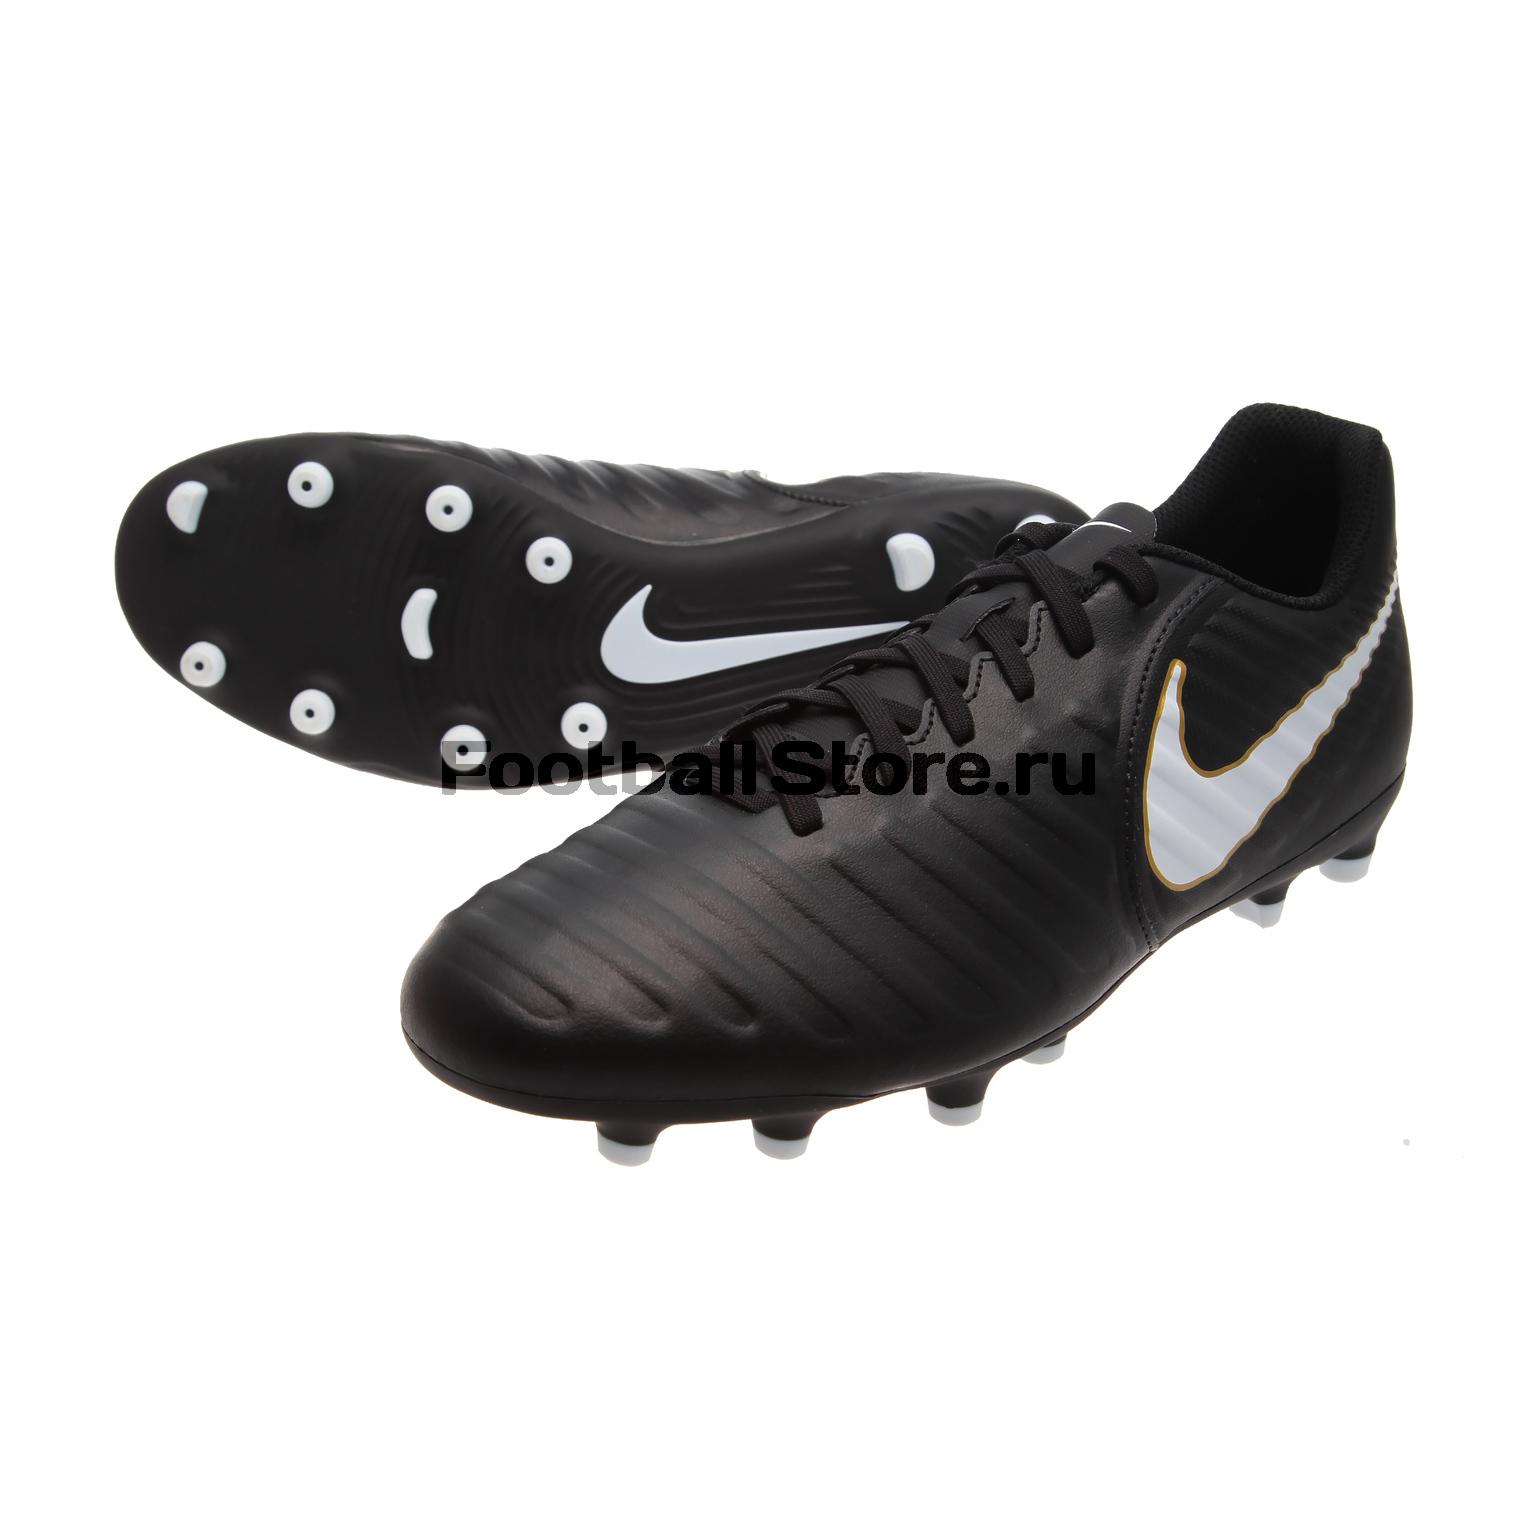 Бутсы Nike Tiempo Rio IV FG 897759-002